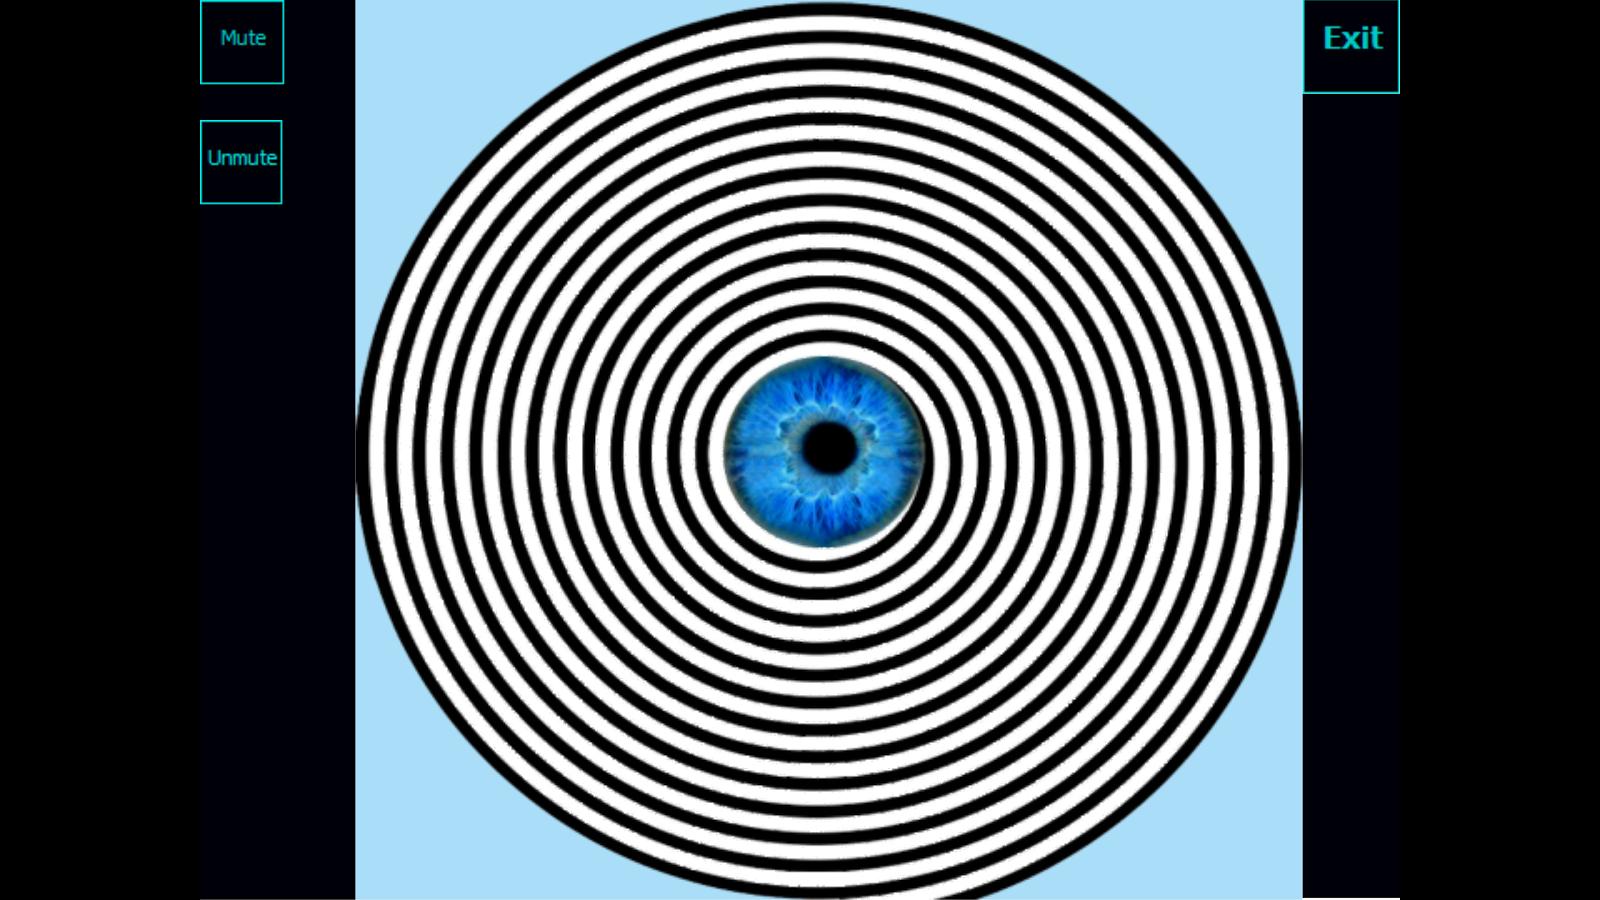 Blue eyesbiokinesis android apps on google play blue eyesbiokinesis screenshot nvjuhfo Image collections